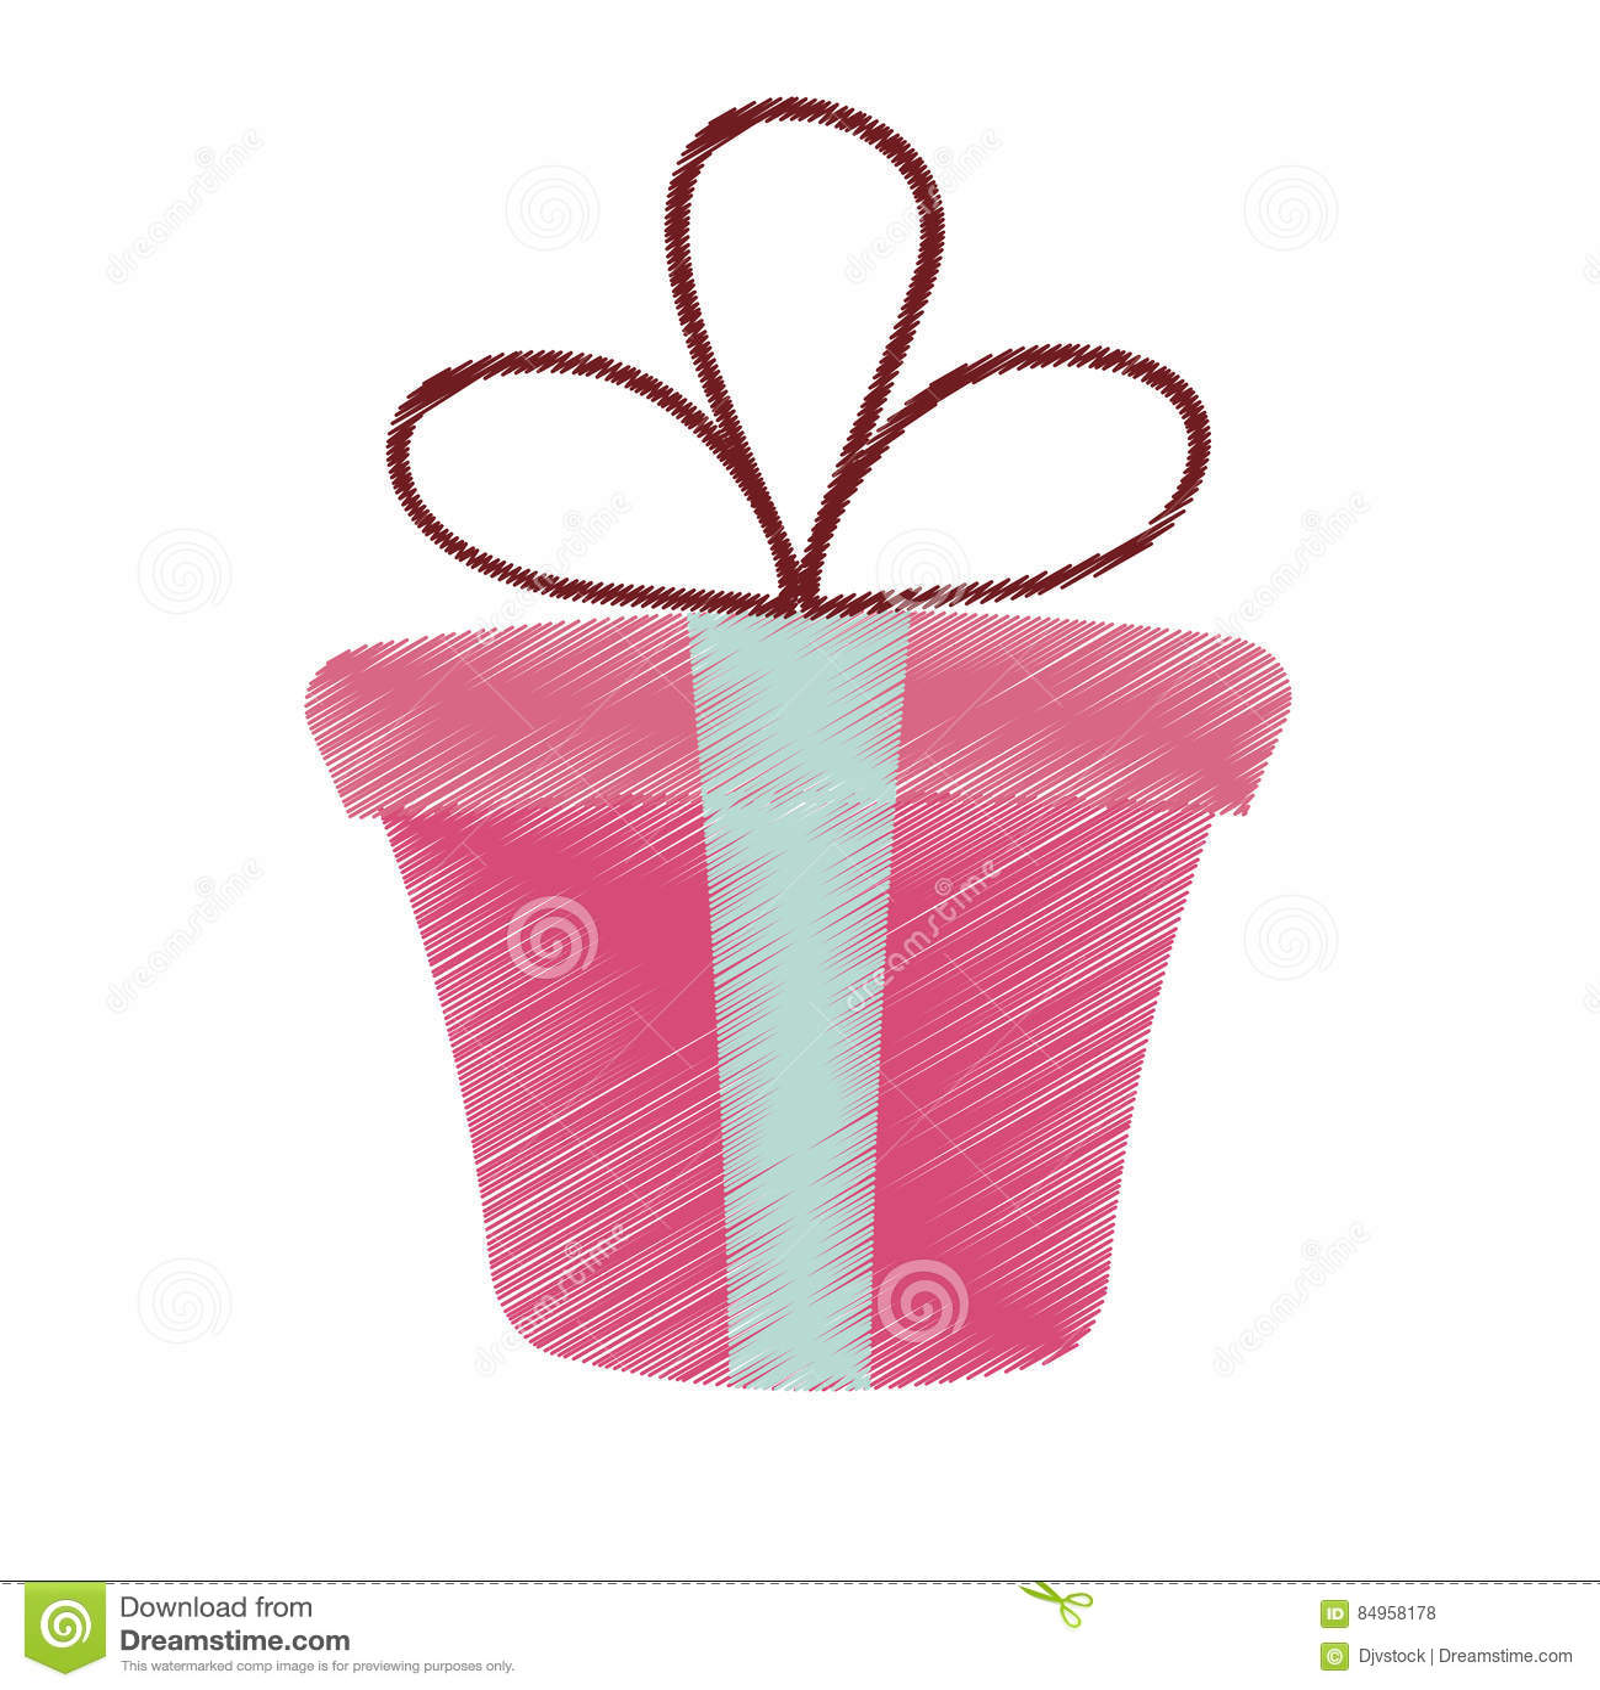 Saint Valentin Rose De Dessin De Ruban De Present De Boite Cadeau